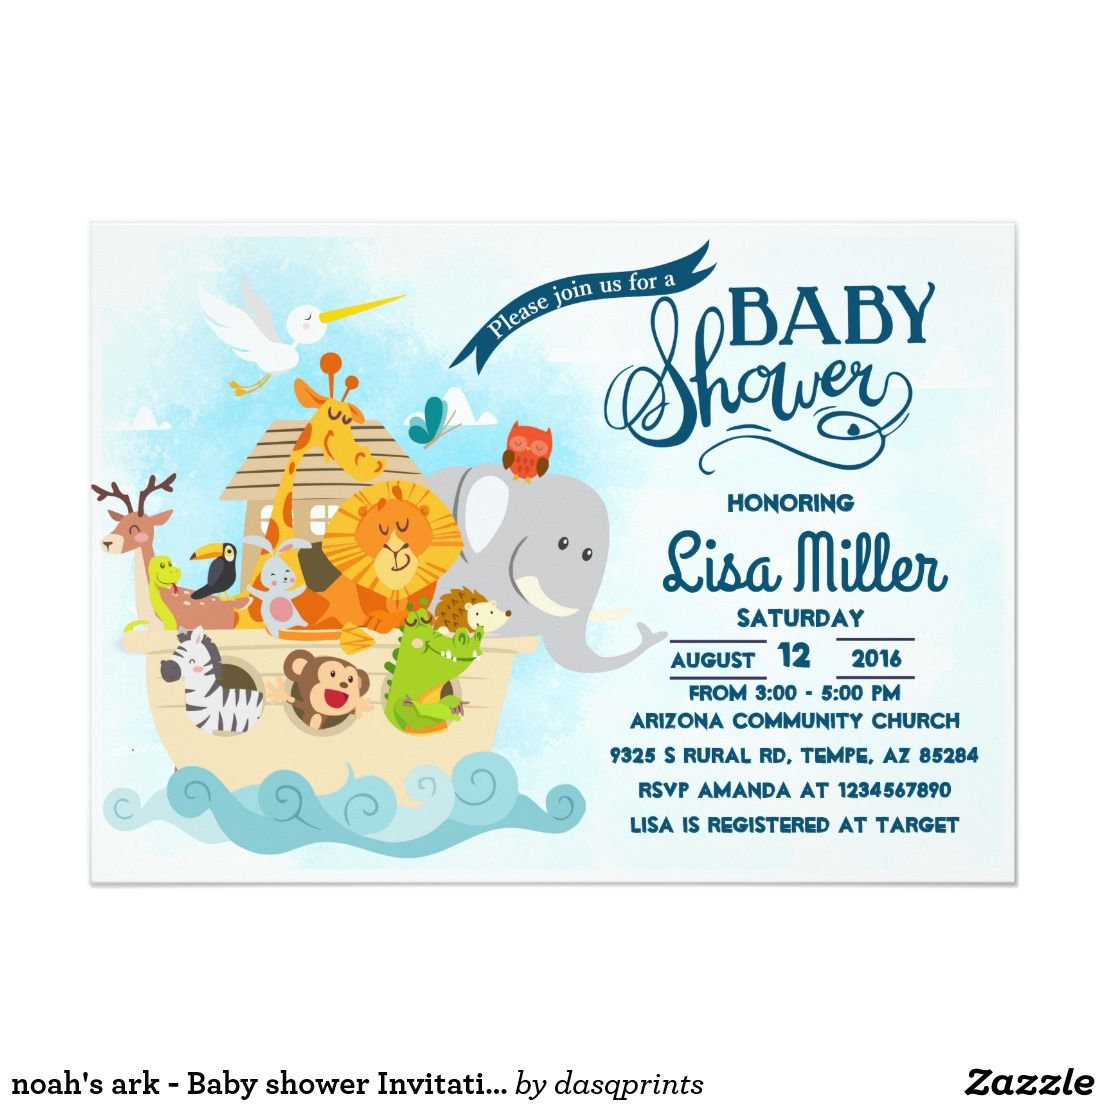 Noah Ark Baby Shower Invitations Images - baby shower invitations ideas